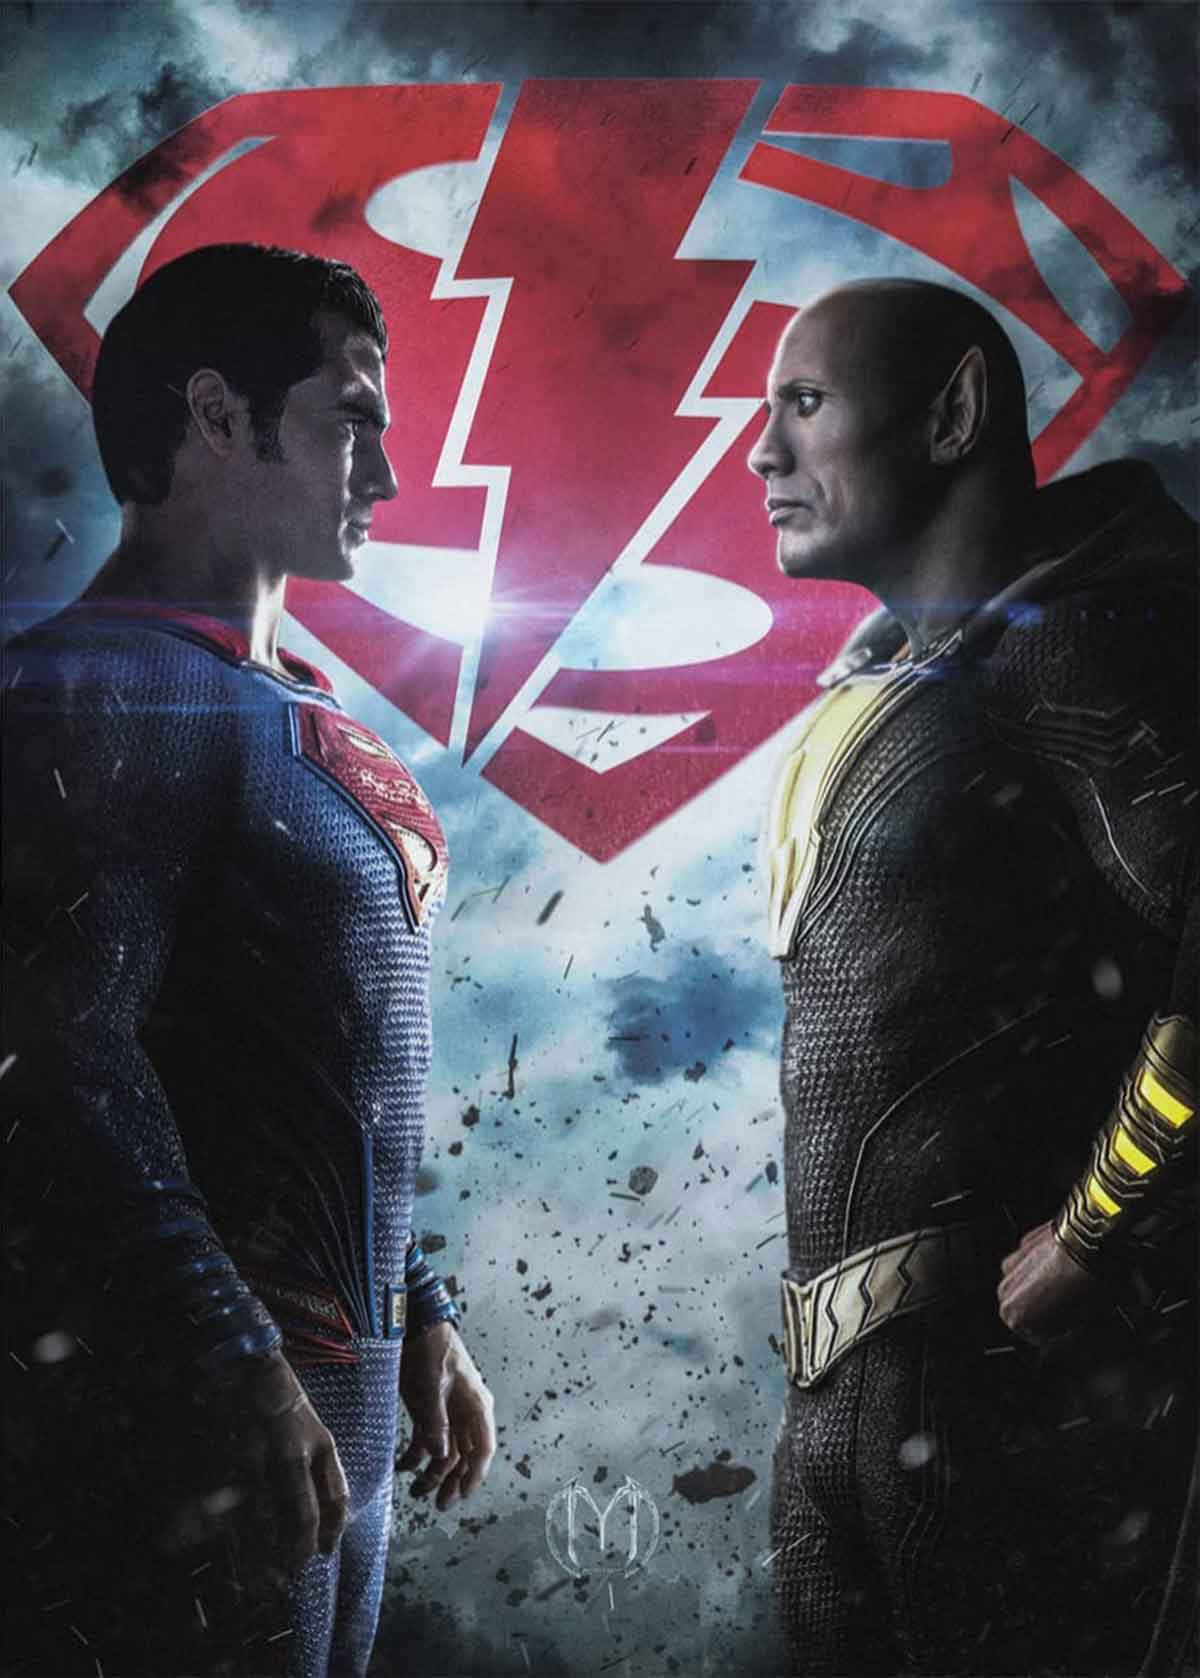 Espectacular Fan Art de Superman (Henry Cavill) vs Black Adam (Dwayne Johnson)